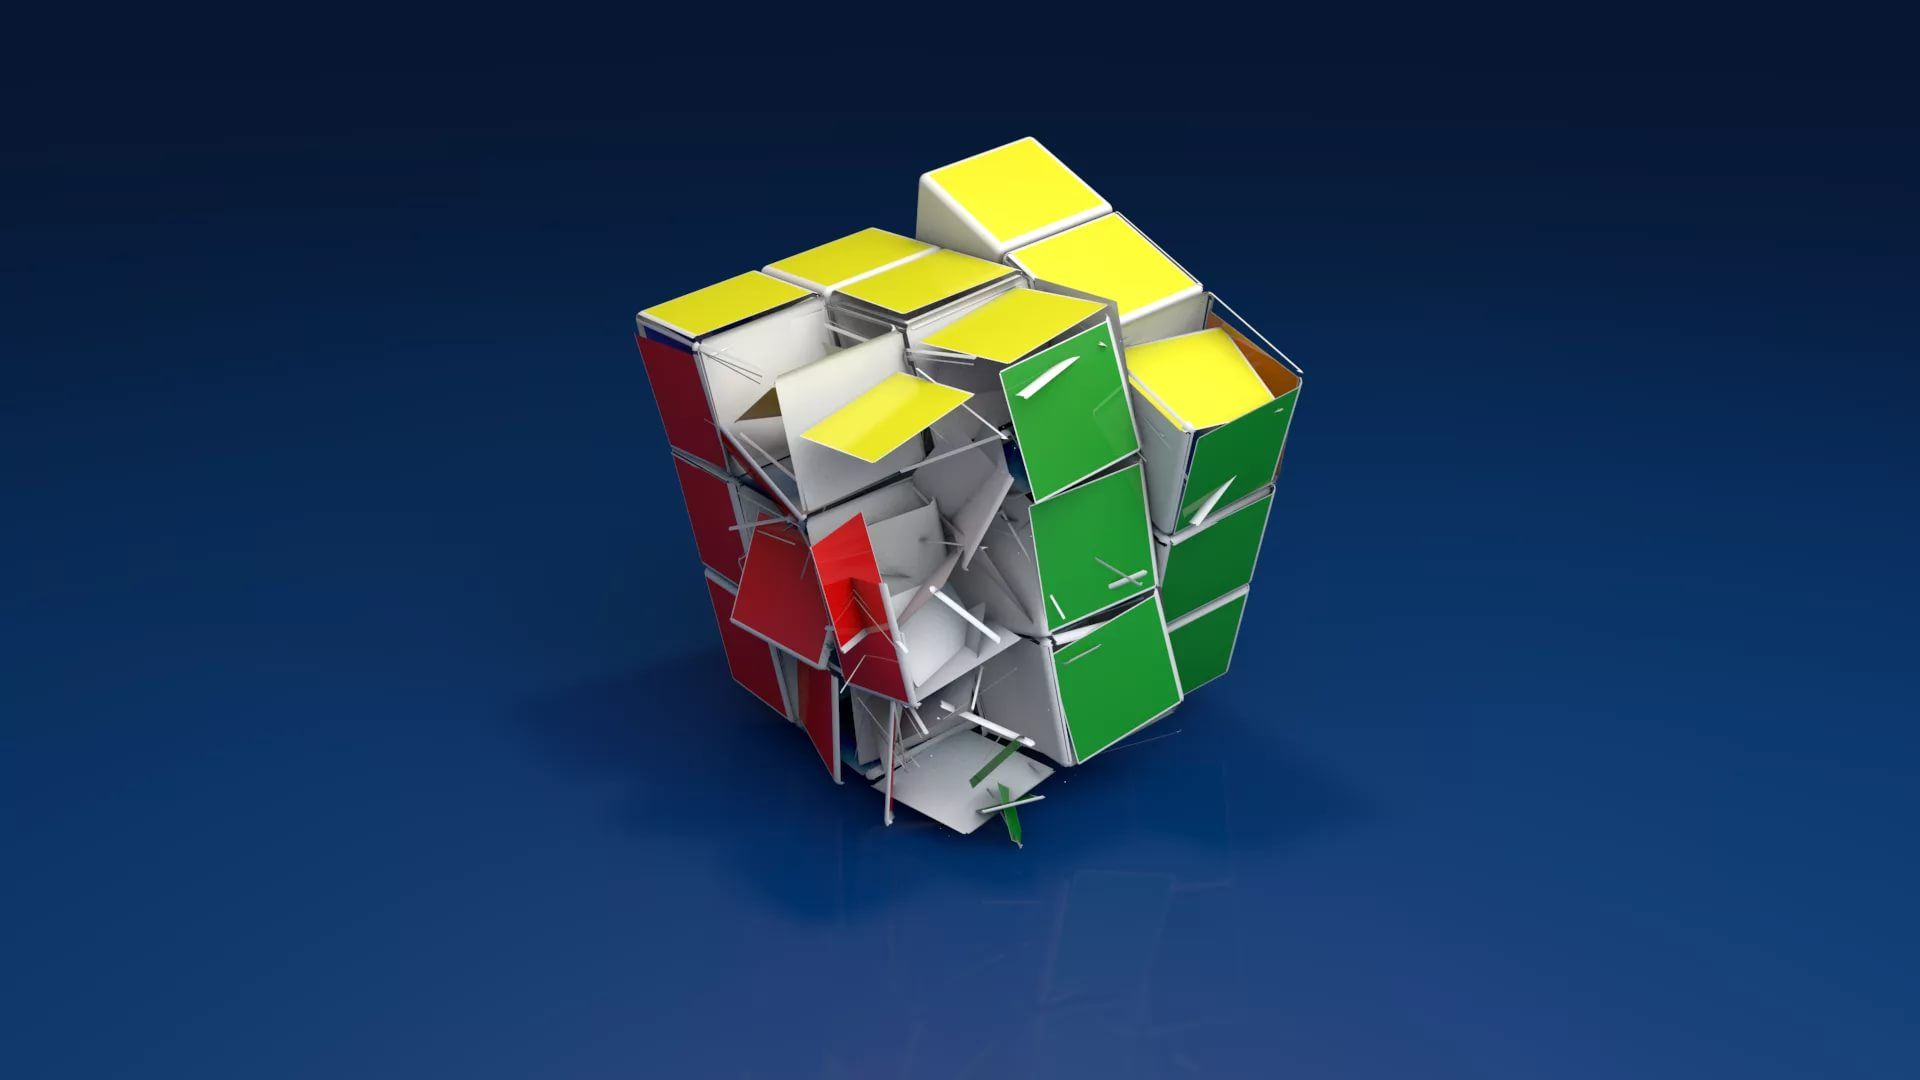 Rubiks Cube computer wallpaper